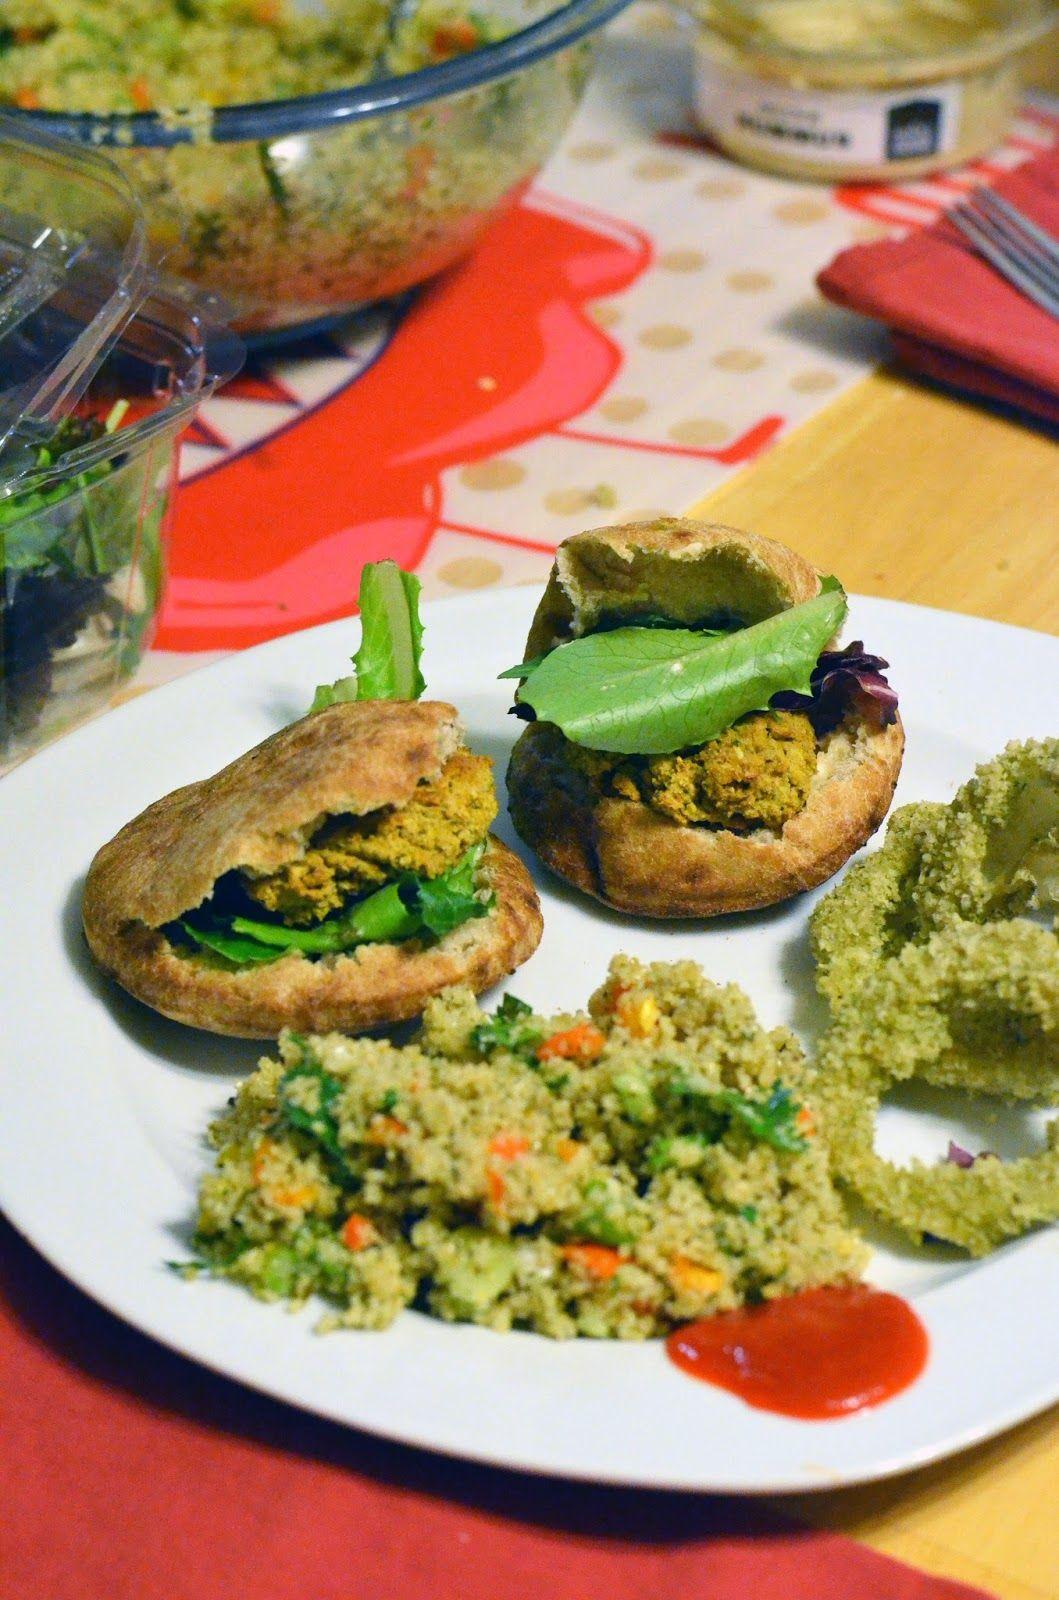 vanishing veggie cookbook creations falafel and onion rings